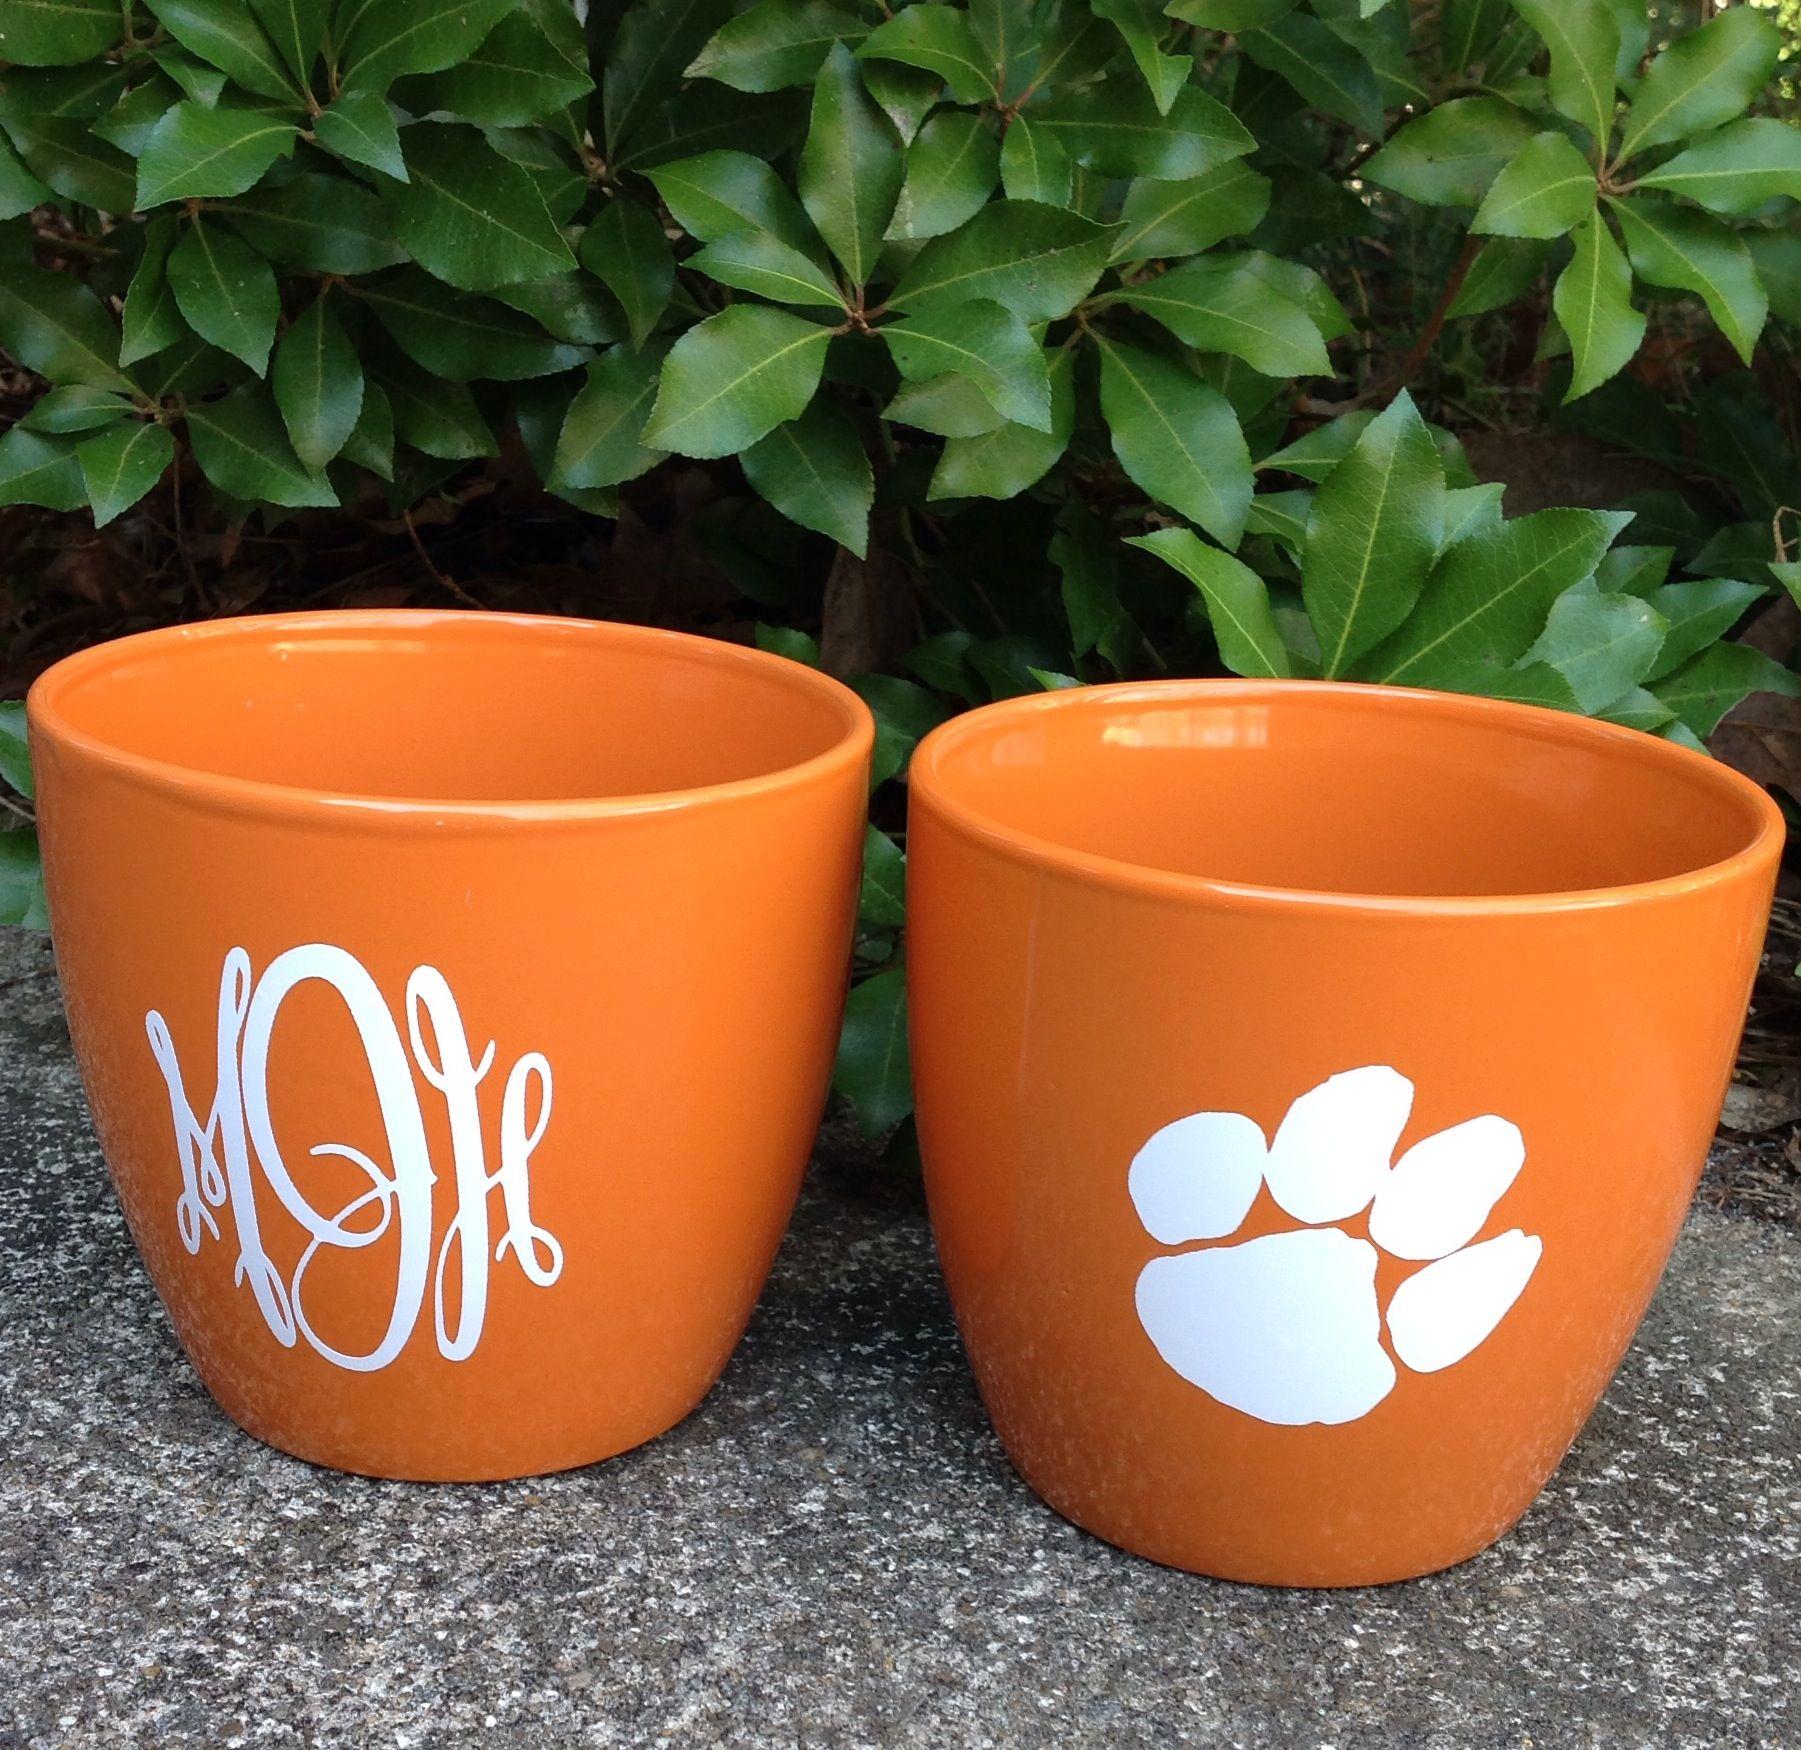 personalized flower pots$8 ea. find me on facebook at petal